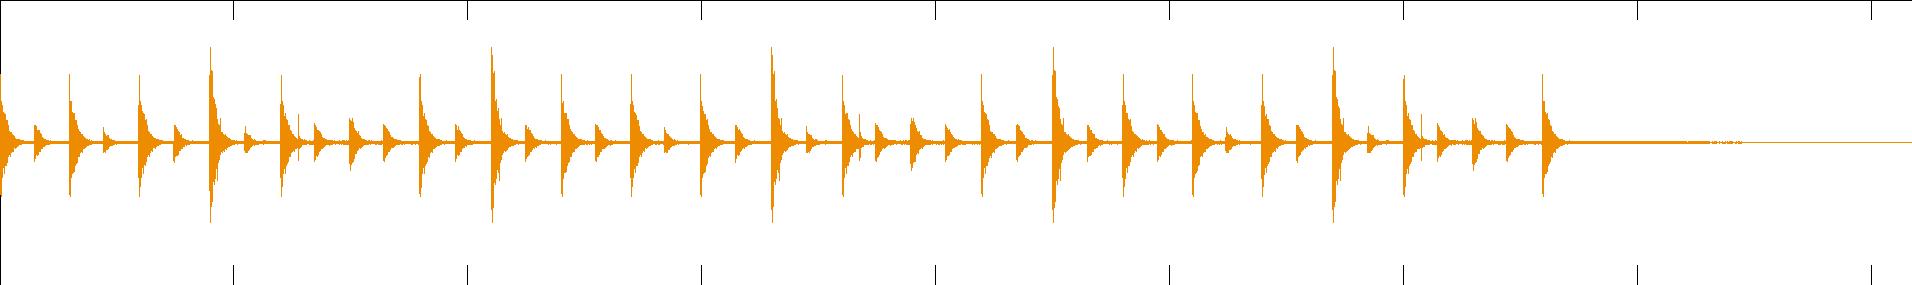 WaveDrum02_23_HH